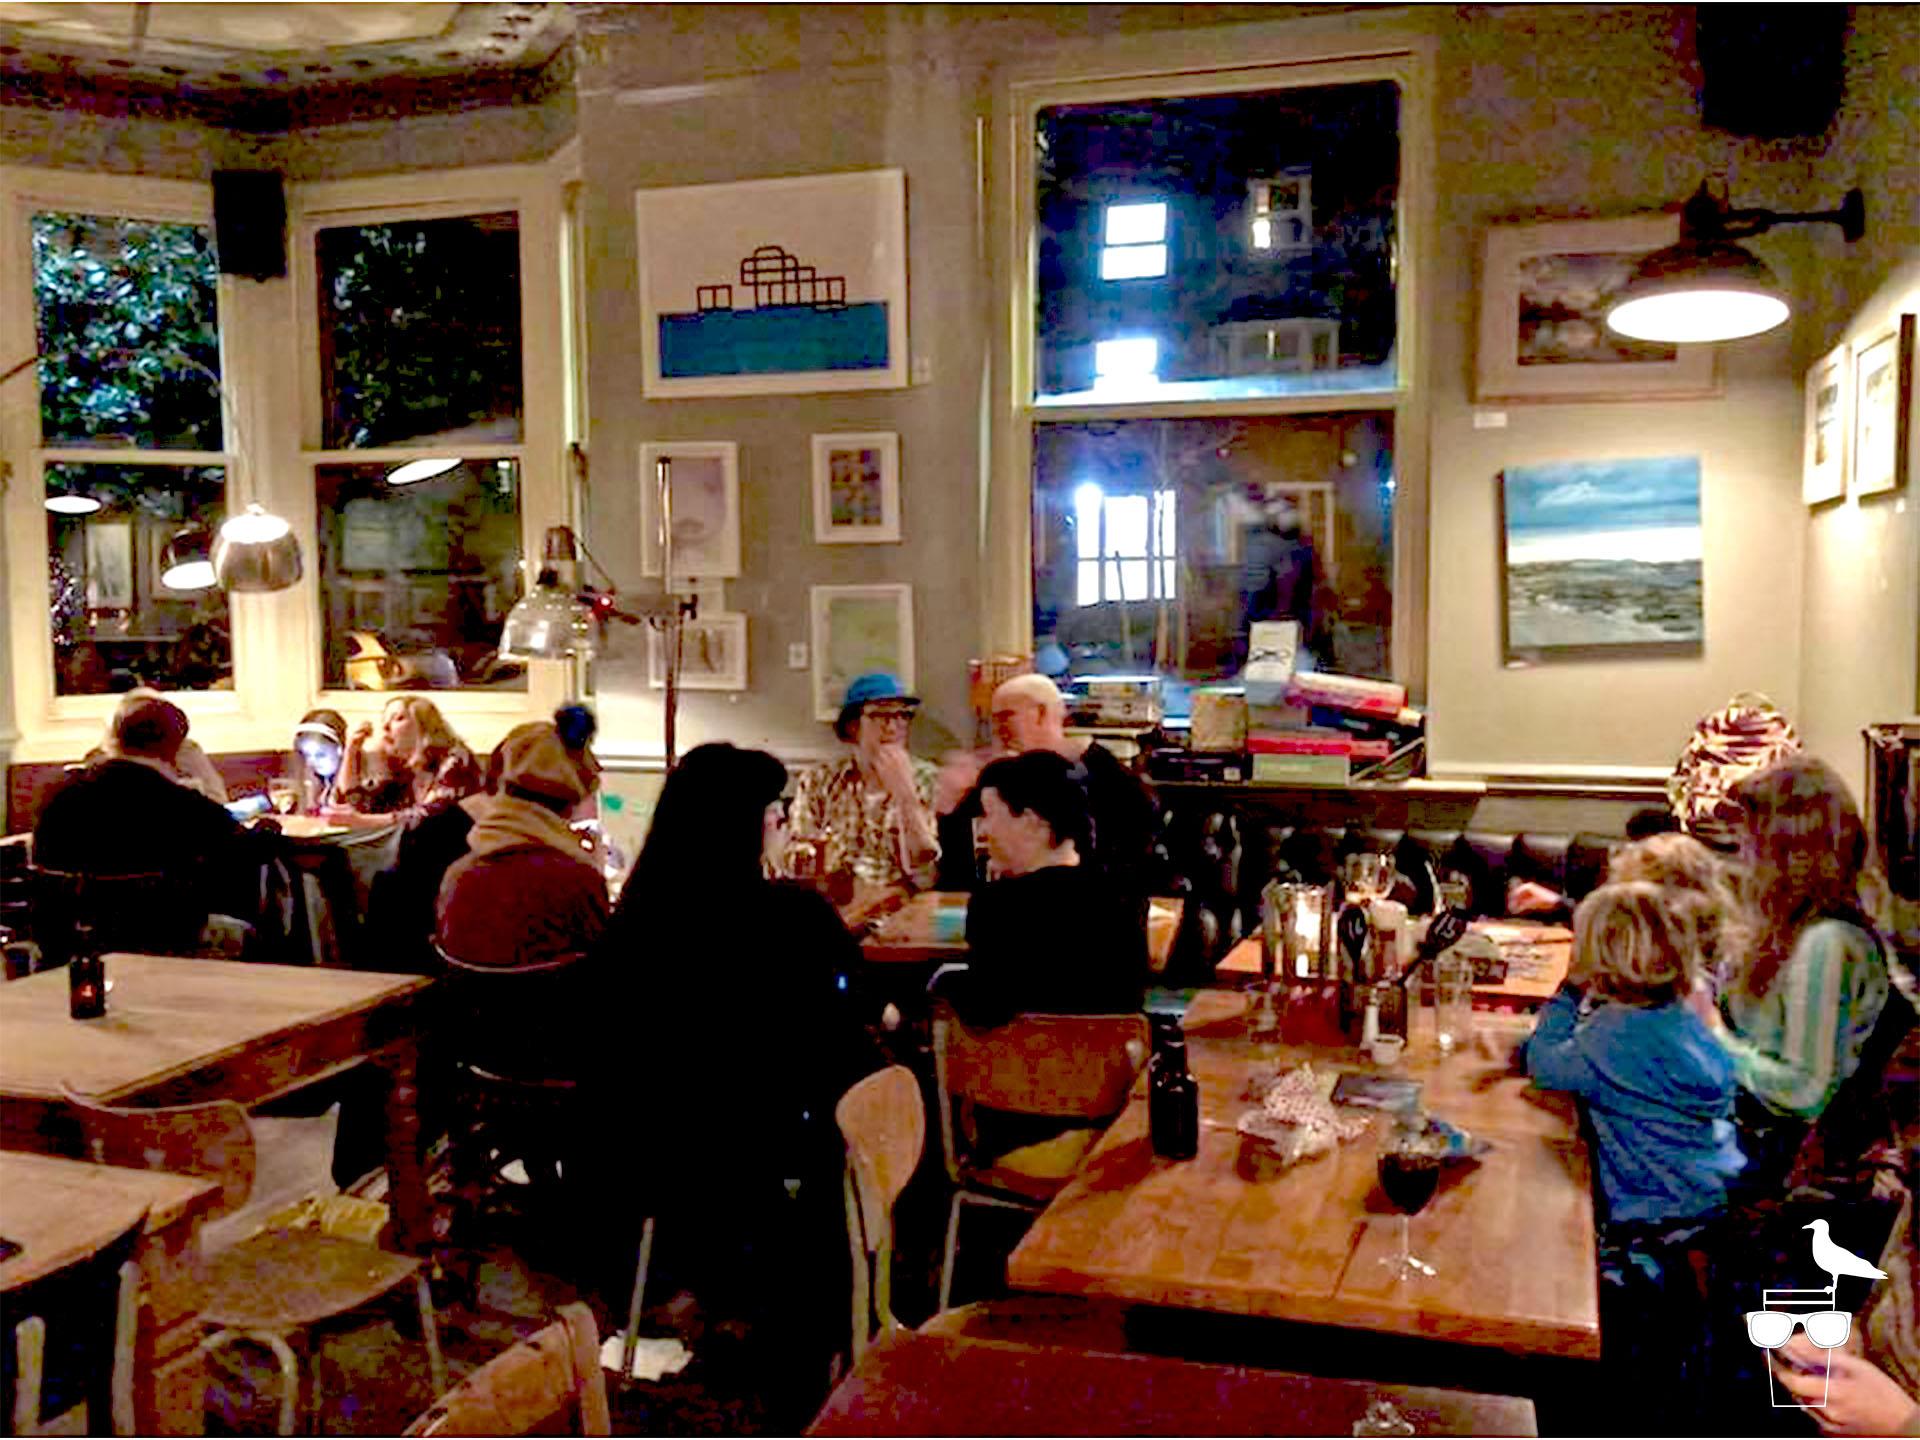 open house pub london road brighton inside dining area